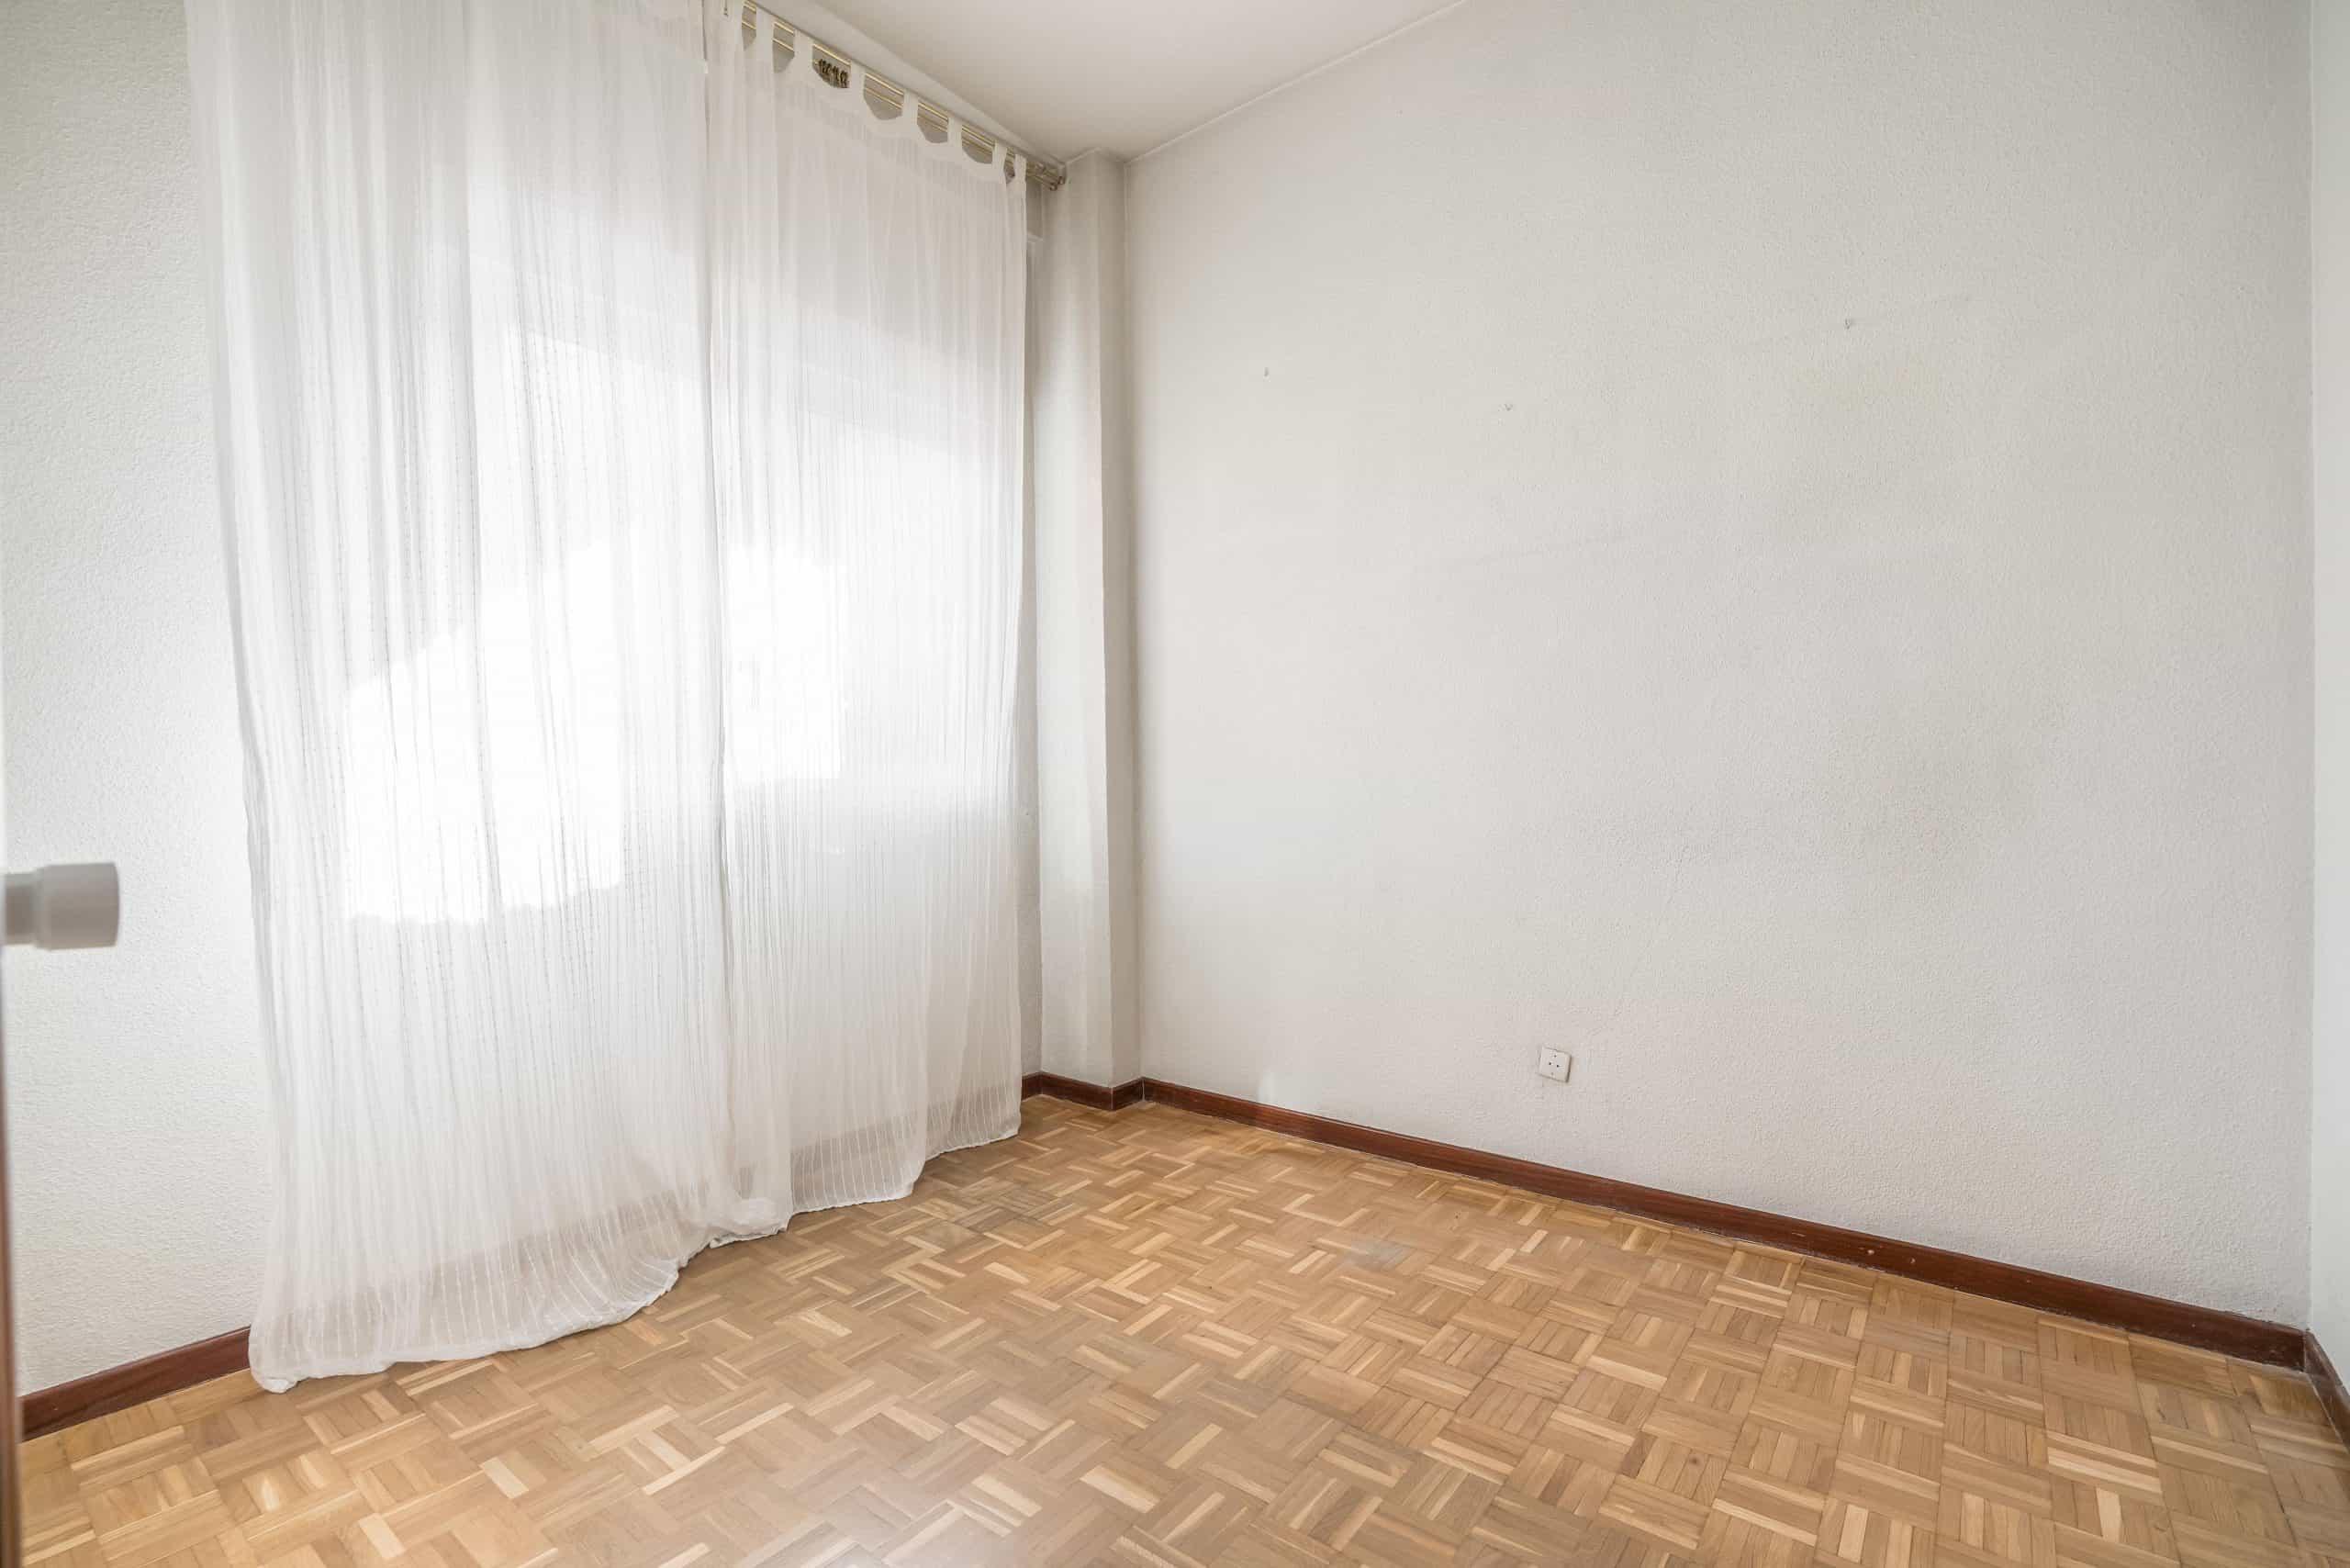 Agencia Inmobiliaria de Madrid-FUTUROCASA-Zona ARGANZUELA-LEGAZPI -calle Jaime Conquistador 48- 2do Dormitorio 1